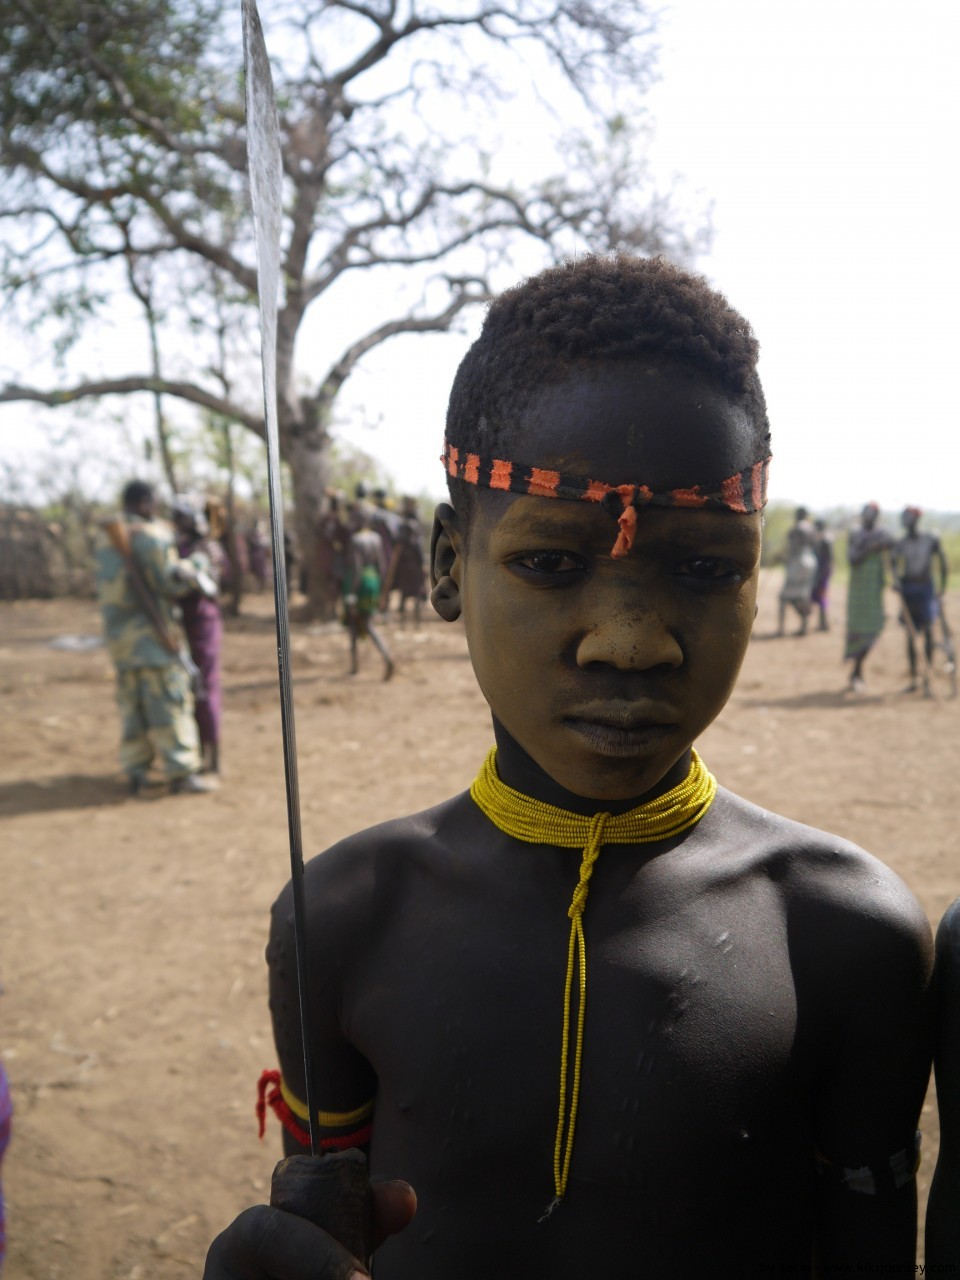 Africa, Ethiopia, Omo River Valley, South Omo, Hamer Tribe